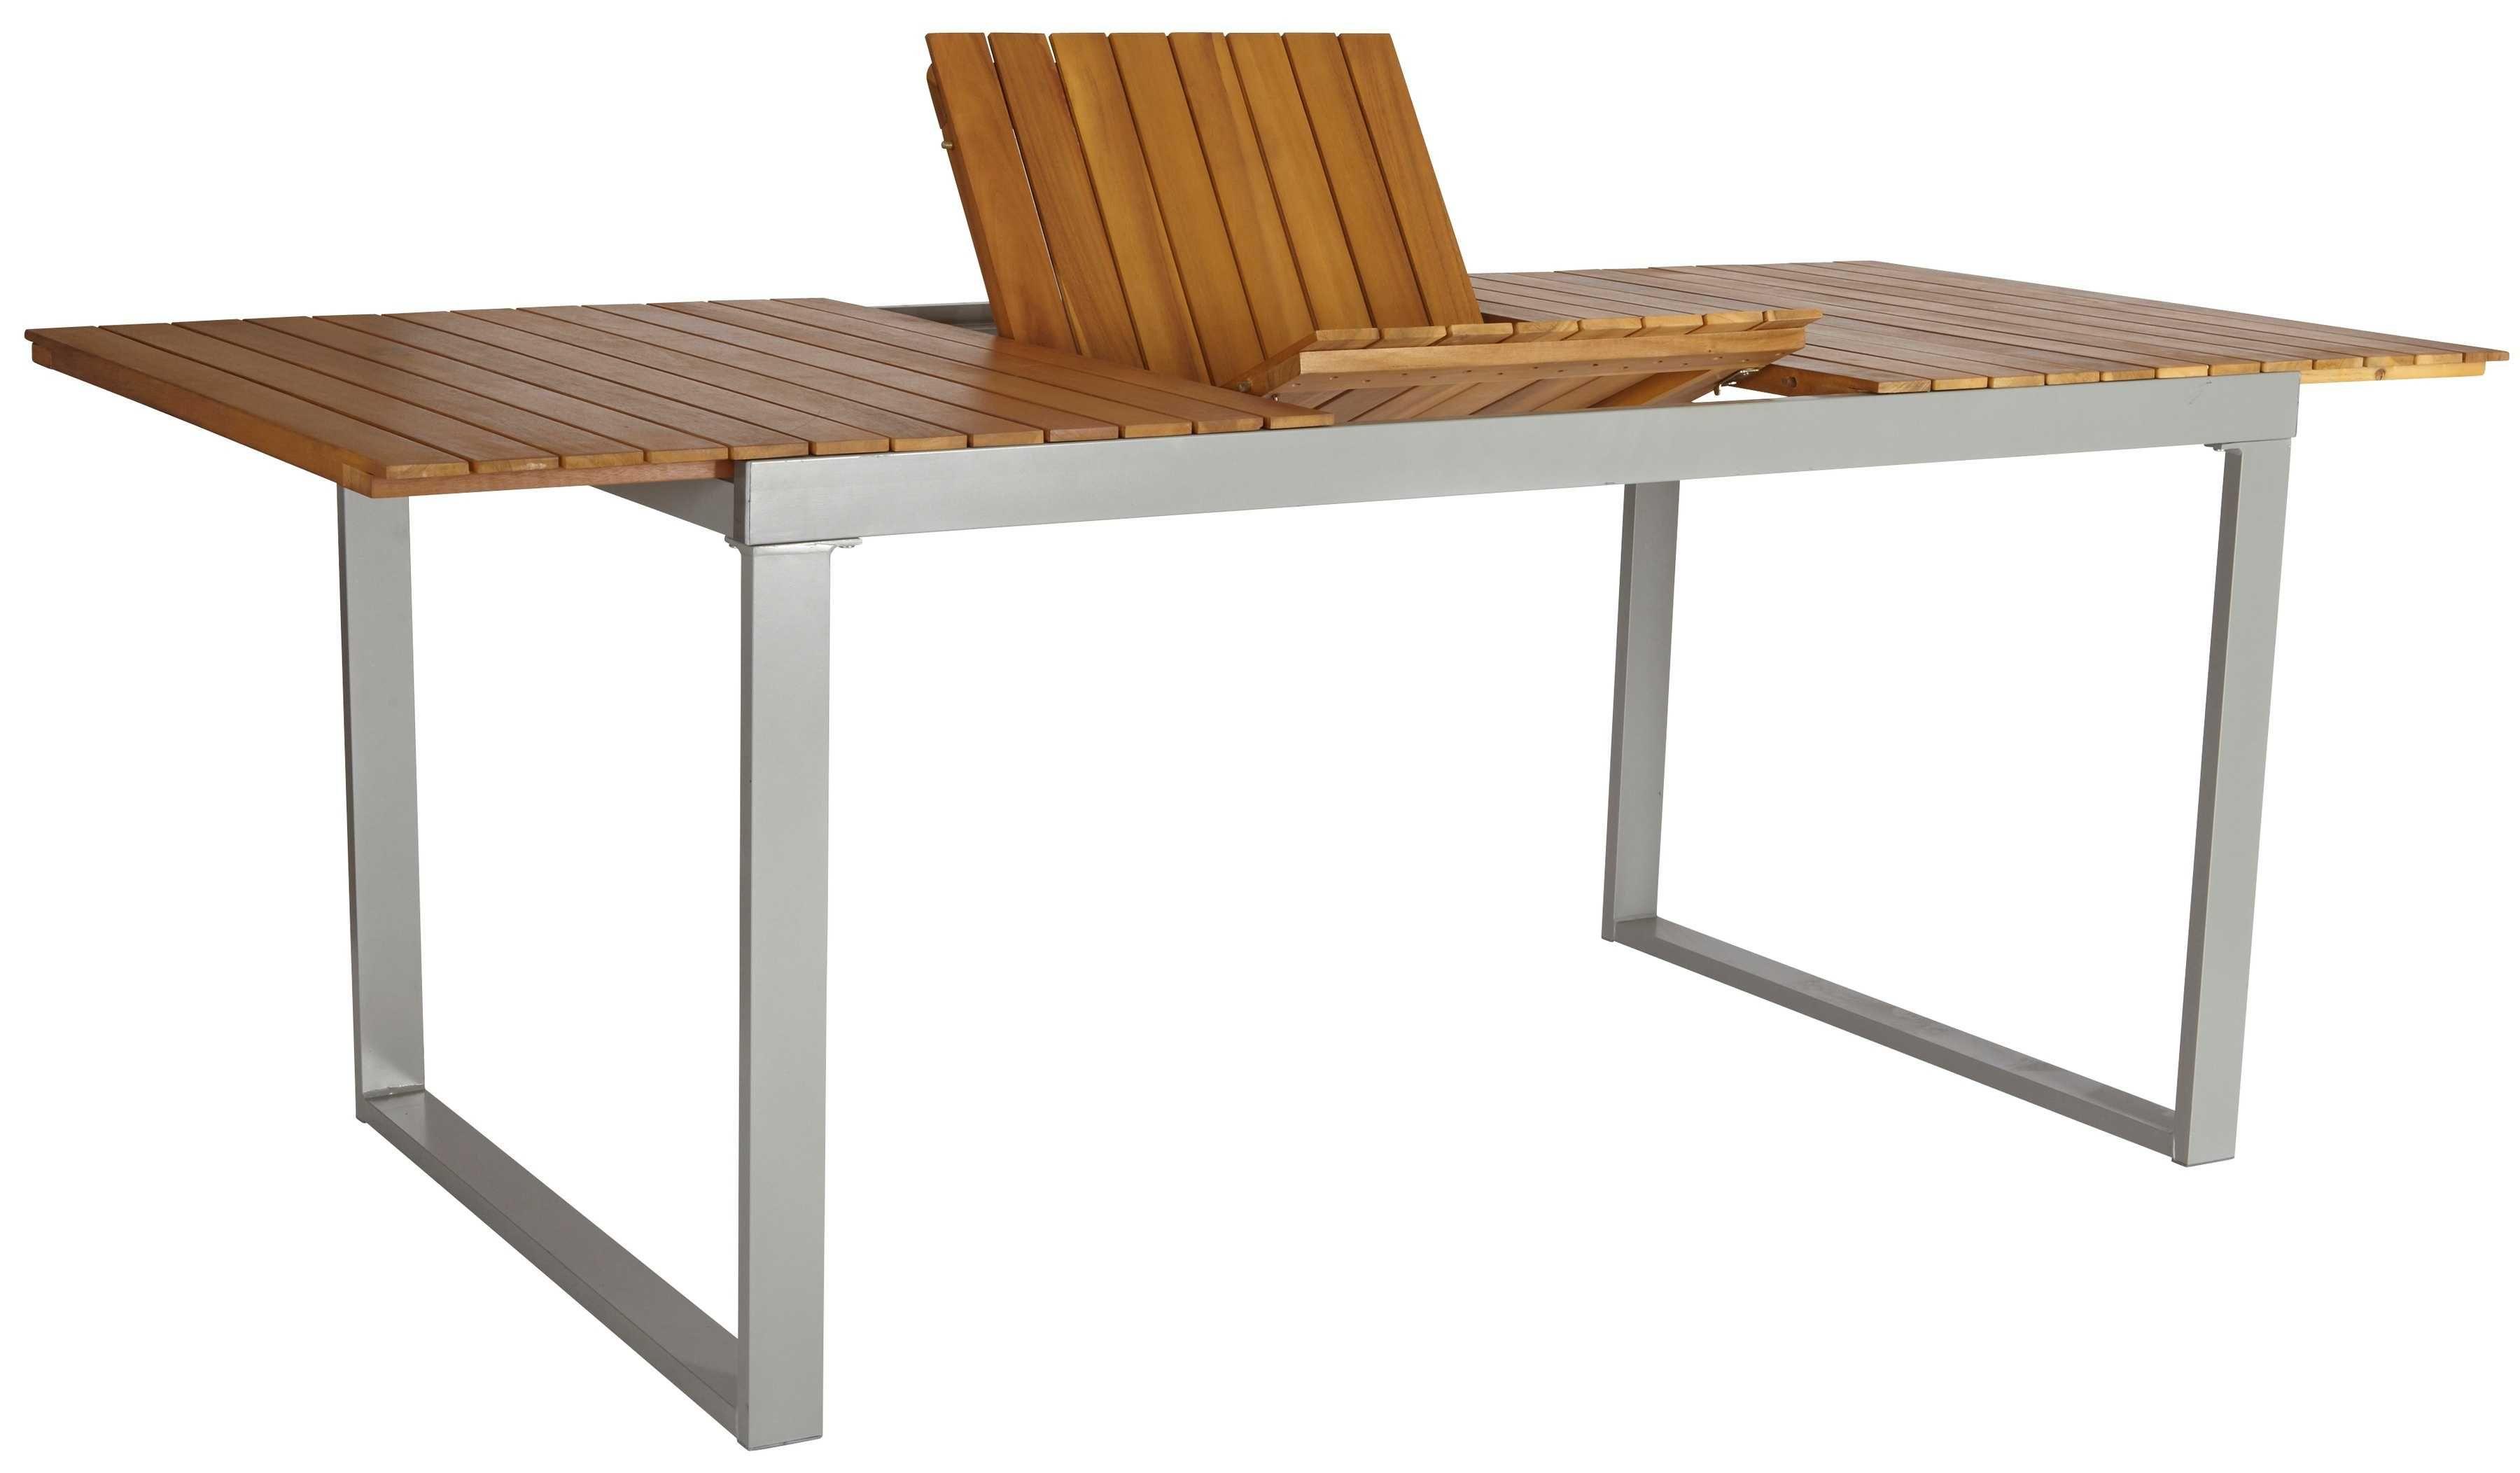 MERXX Gartentisch »Monaco«, Alu/Akazienholz, ausziehbar